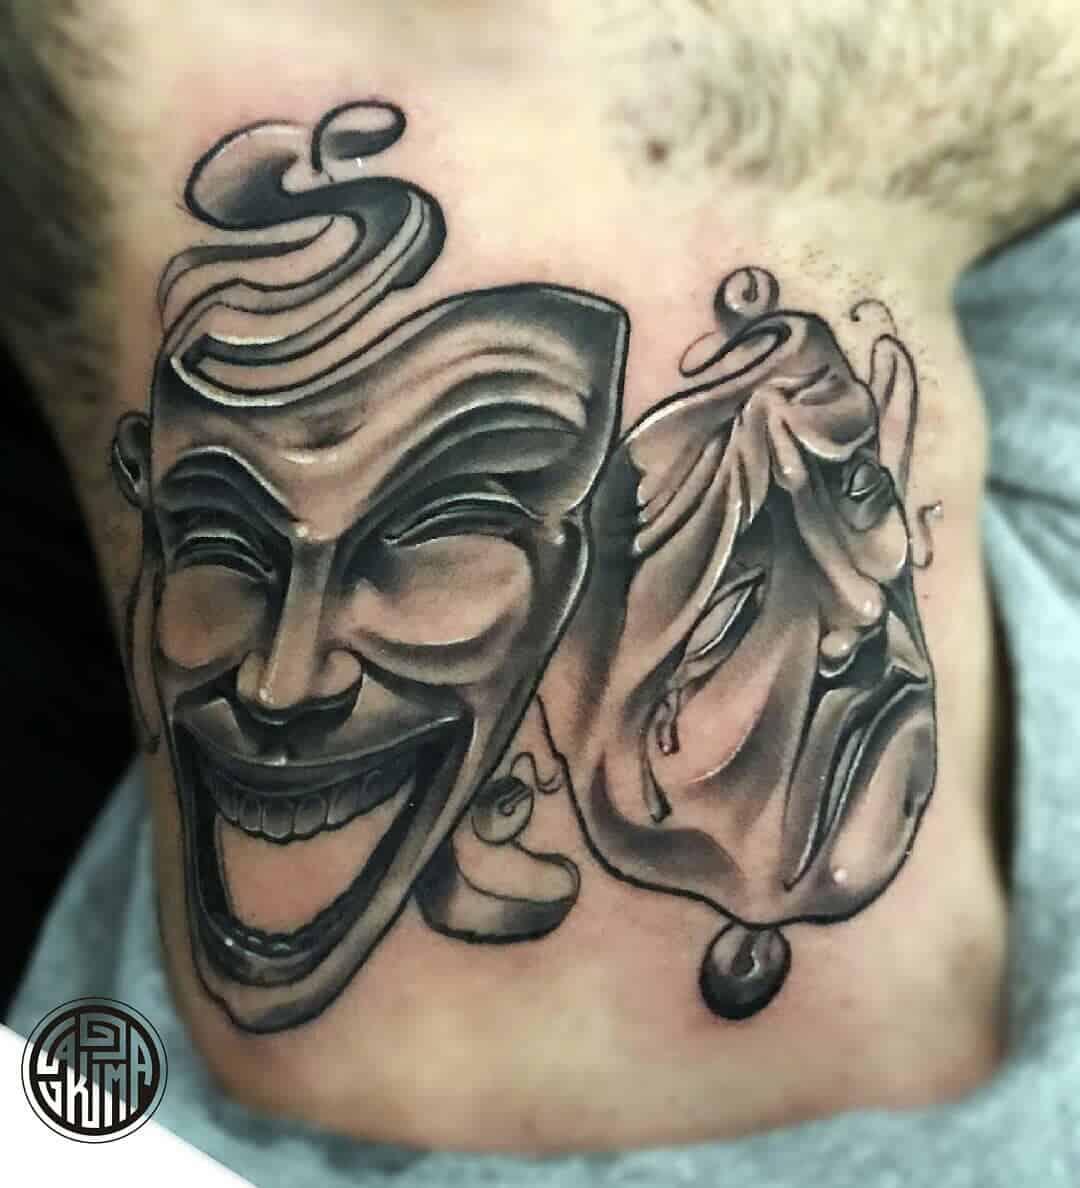 Tattoo by @lakimatattoo